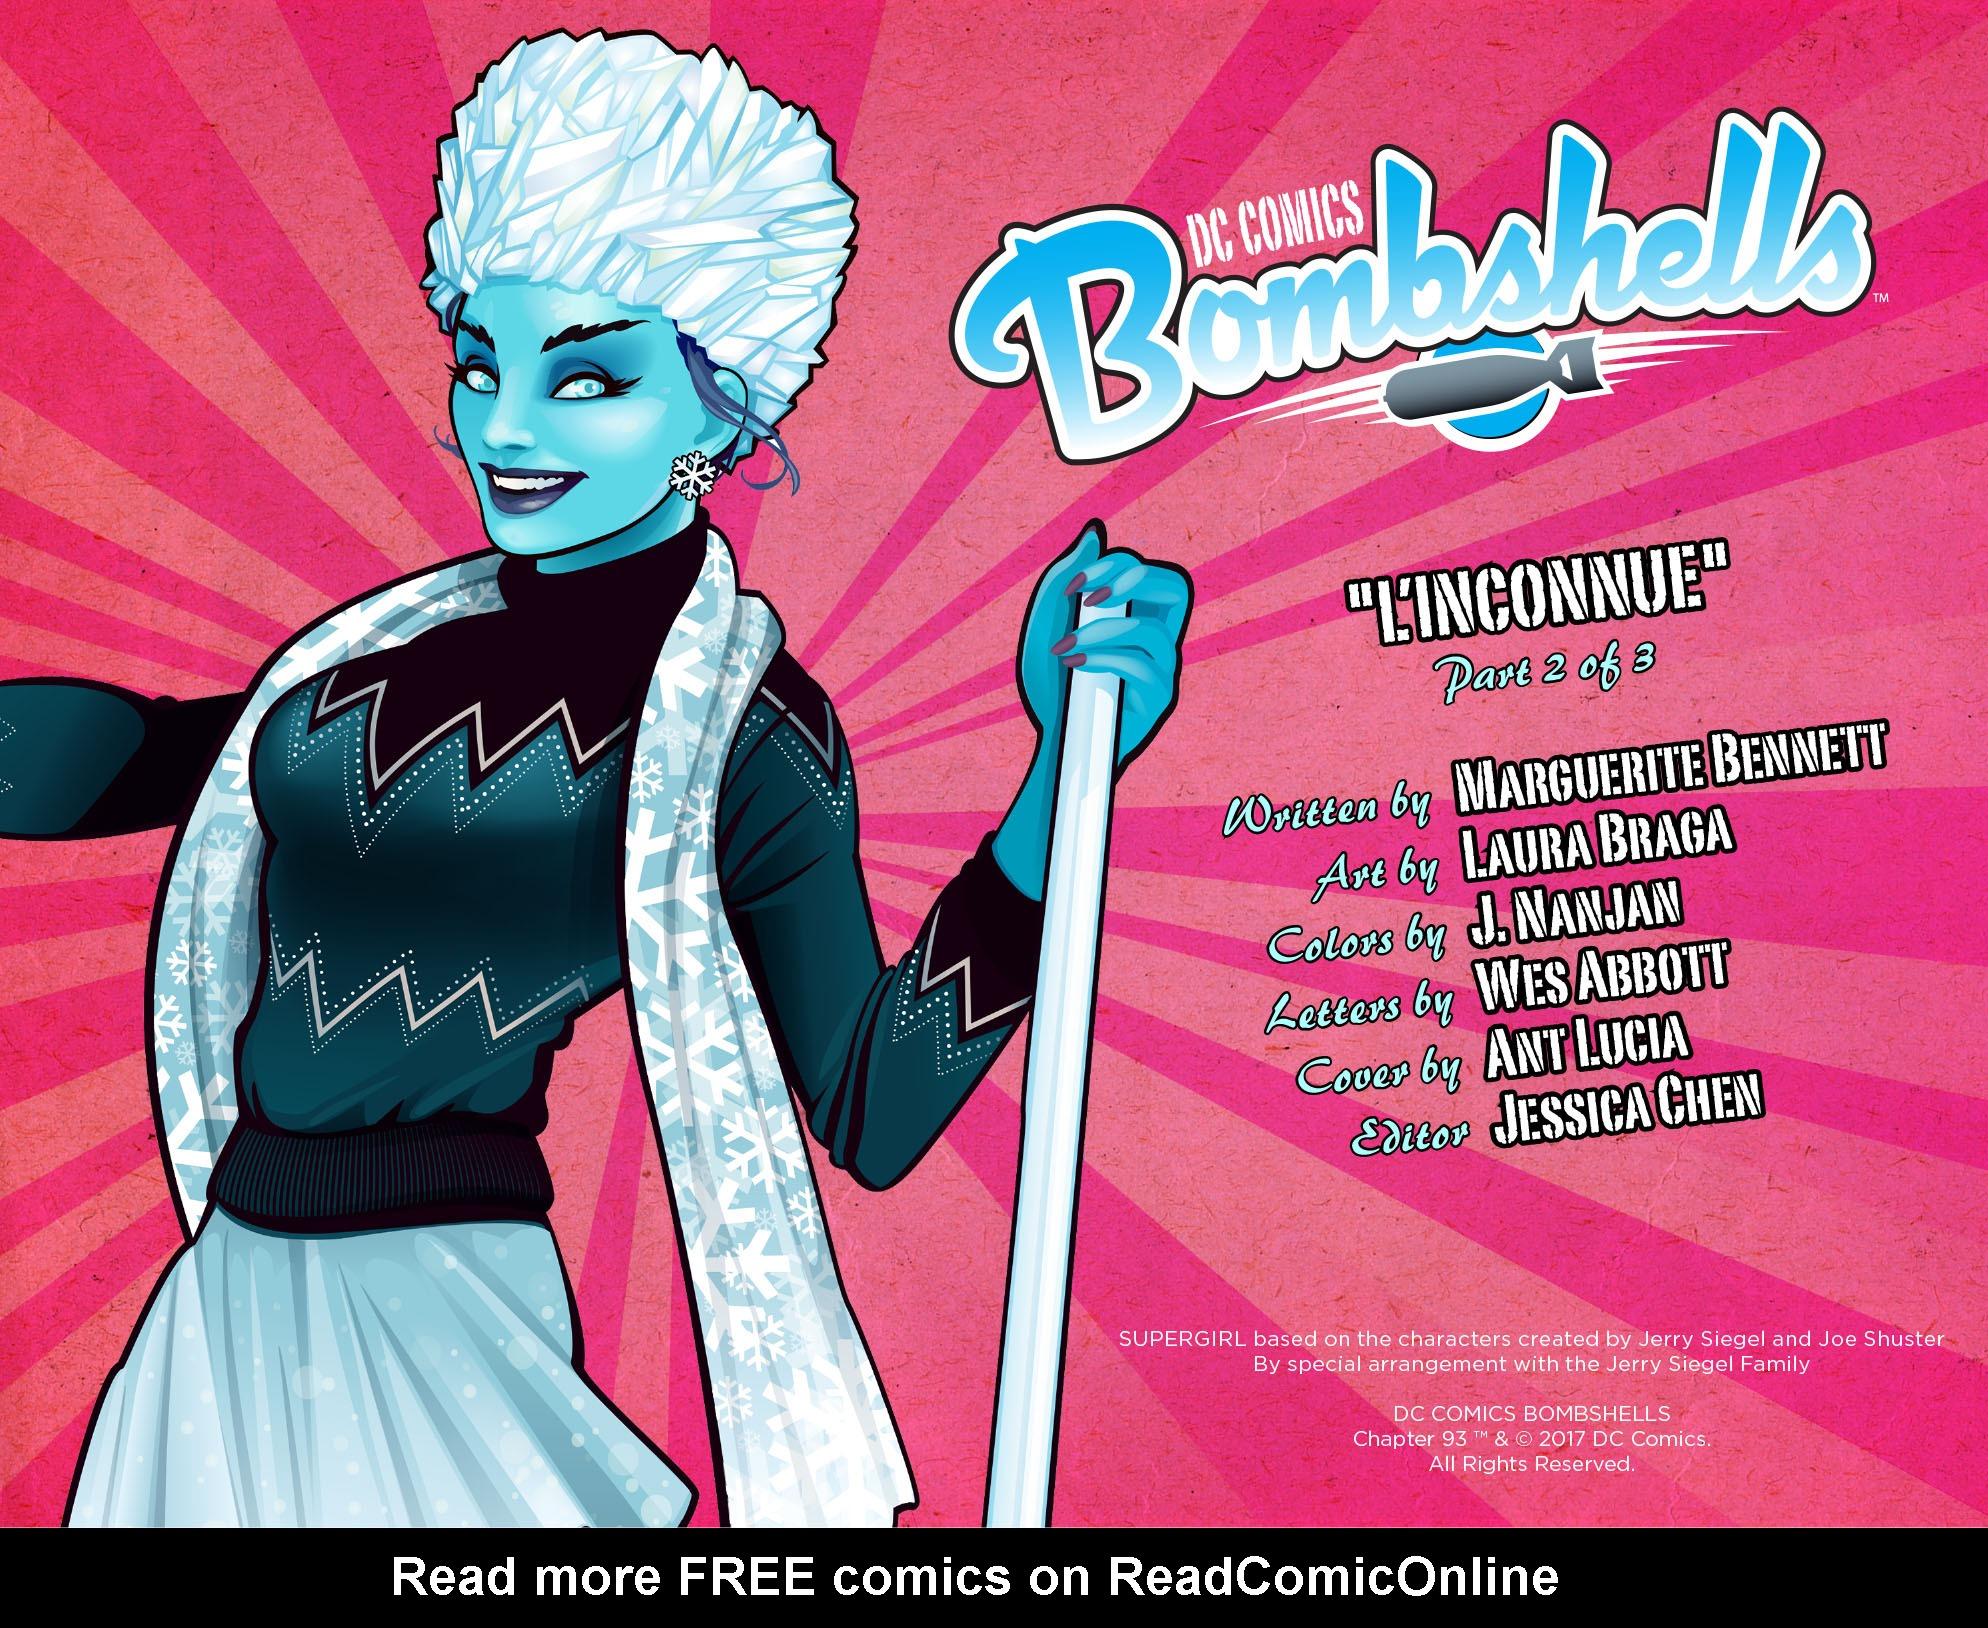 Read online DC Comics: Bombshells comic -  Issue #93 - 3